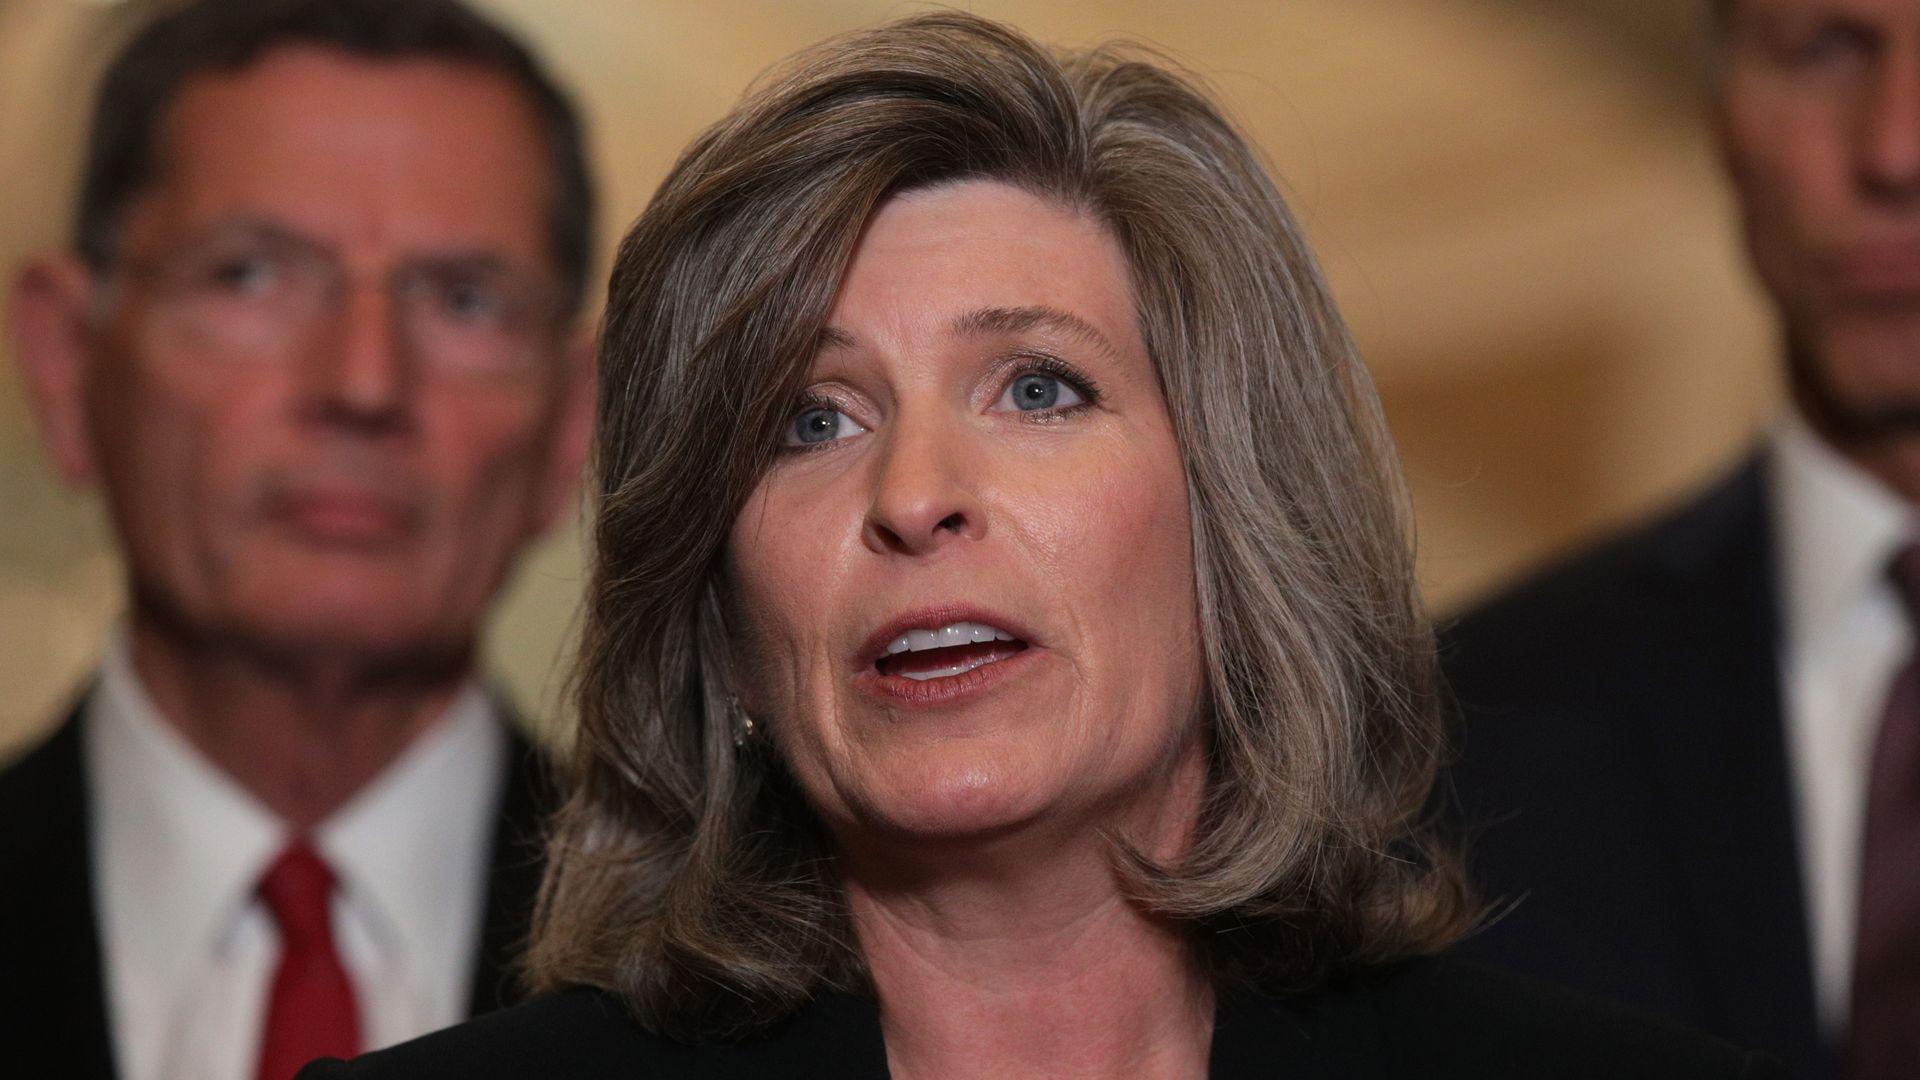 GOP Sen. Jodi Ernst joins Chuck Grassley in defending whistleblower